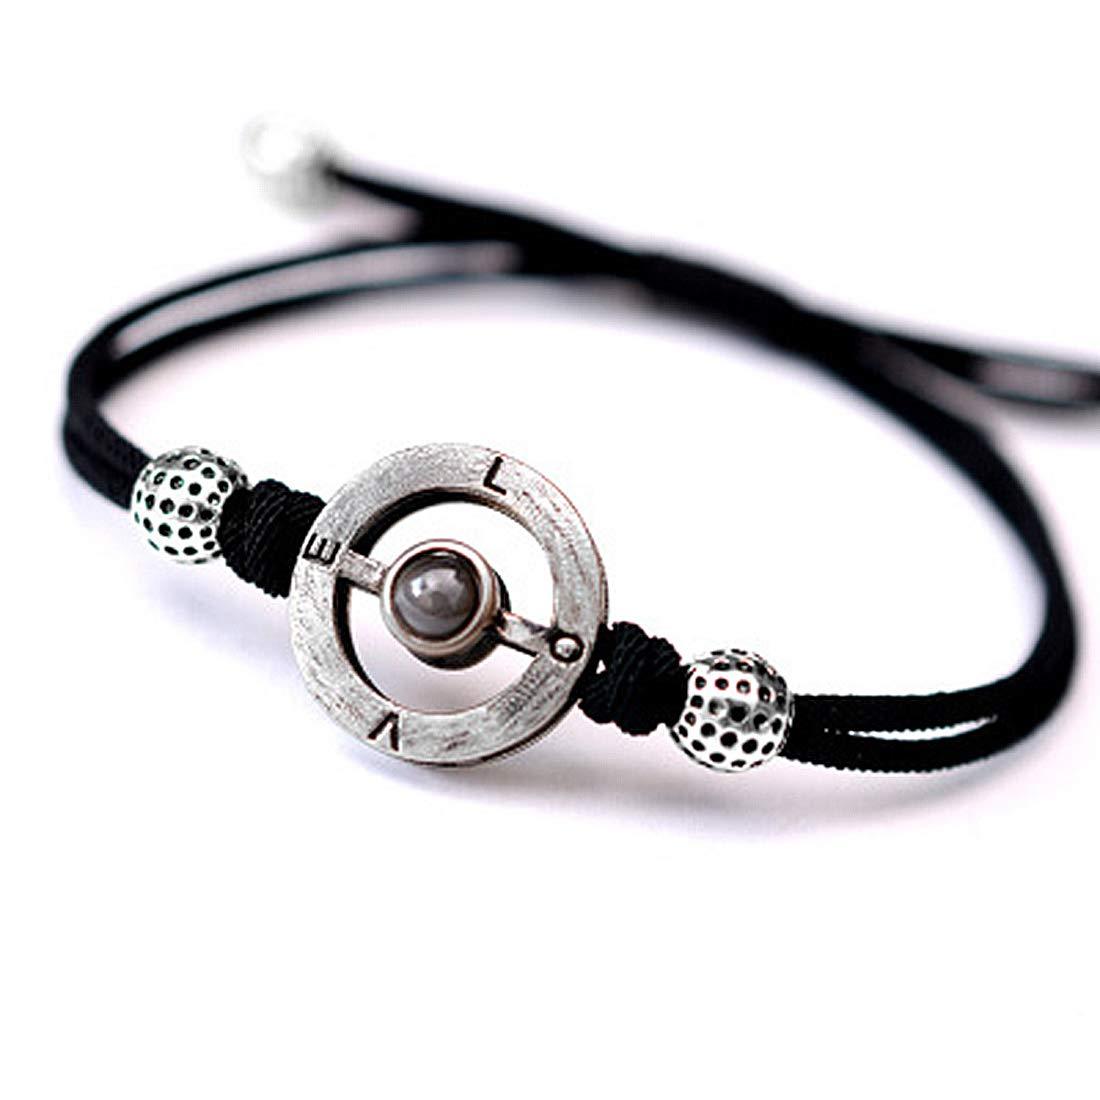 100 Languages Love Memory Handmade Rope Adjustable Couple Bracelet Memorable Gift for Sister and Lover. FREEMODE I Love You Bracelet